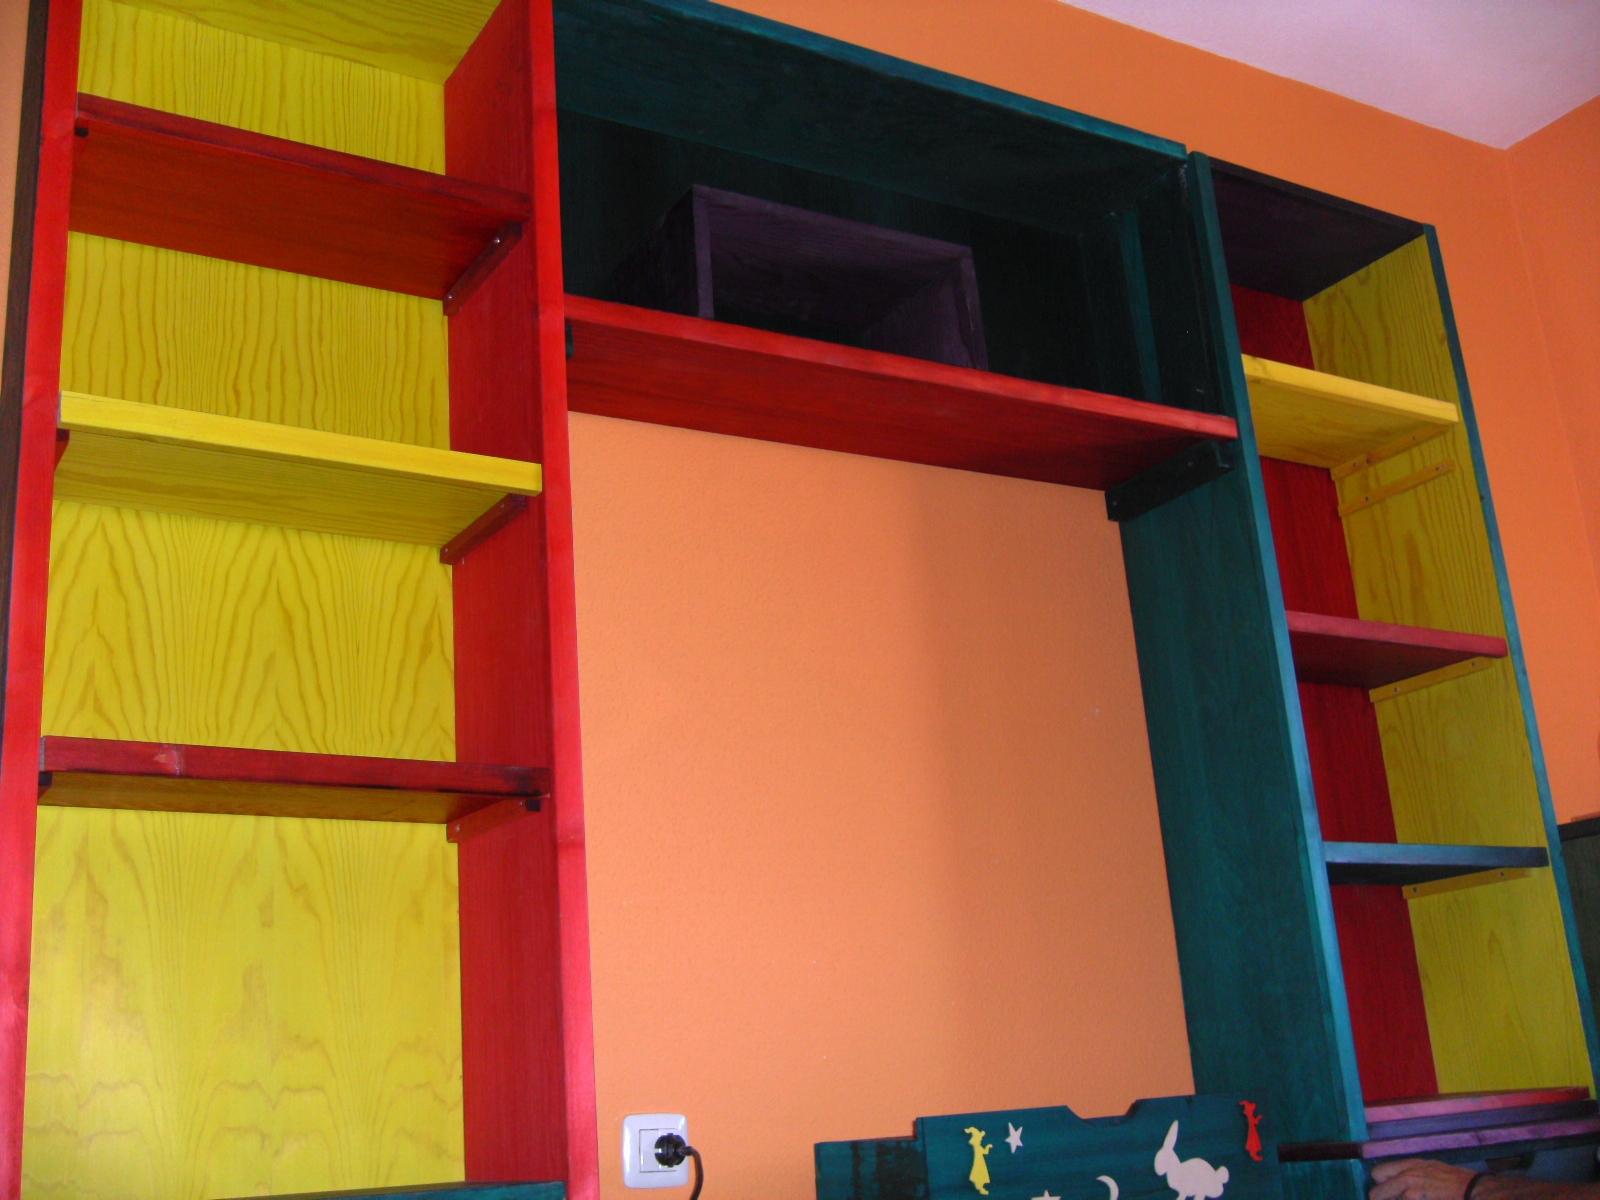 Mueble para ni os for Muebles de madera para ninos